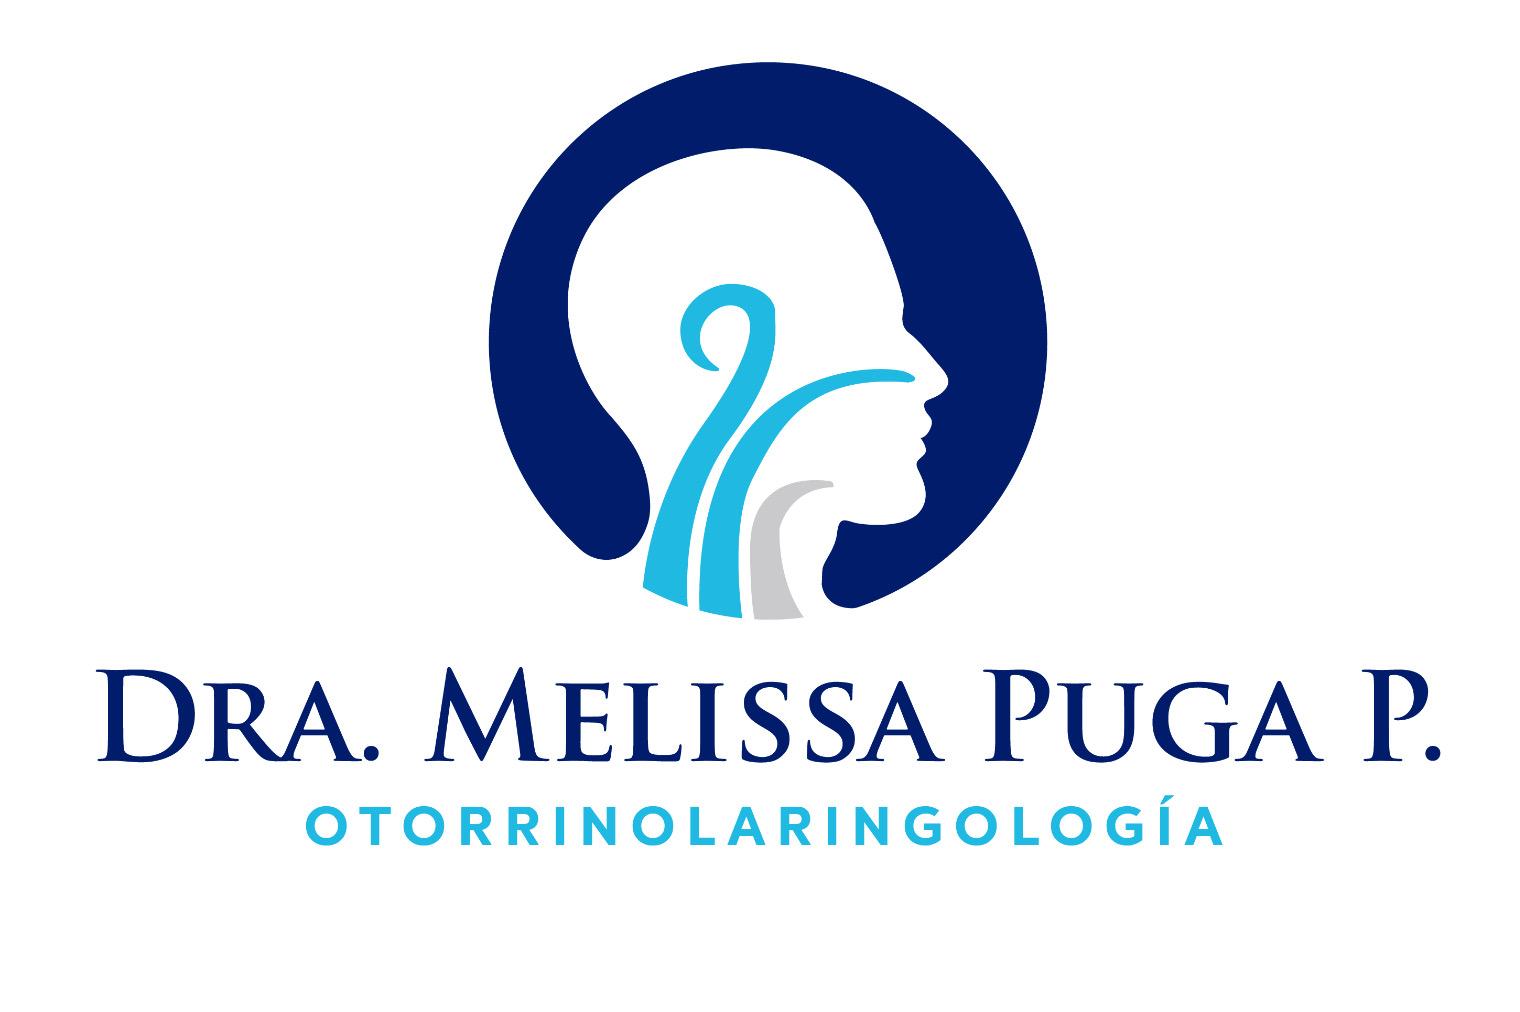 Dra. Melissa Puga